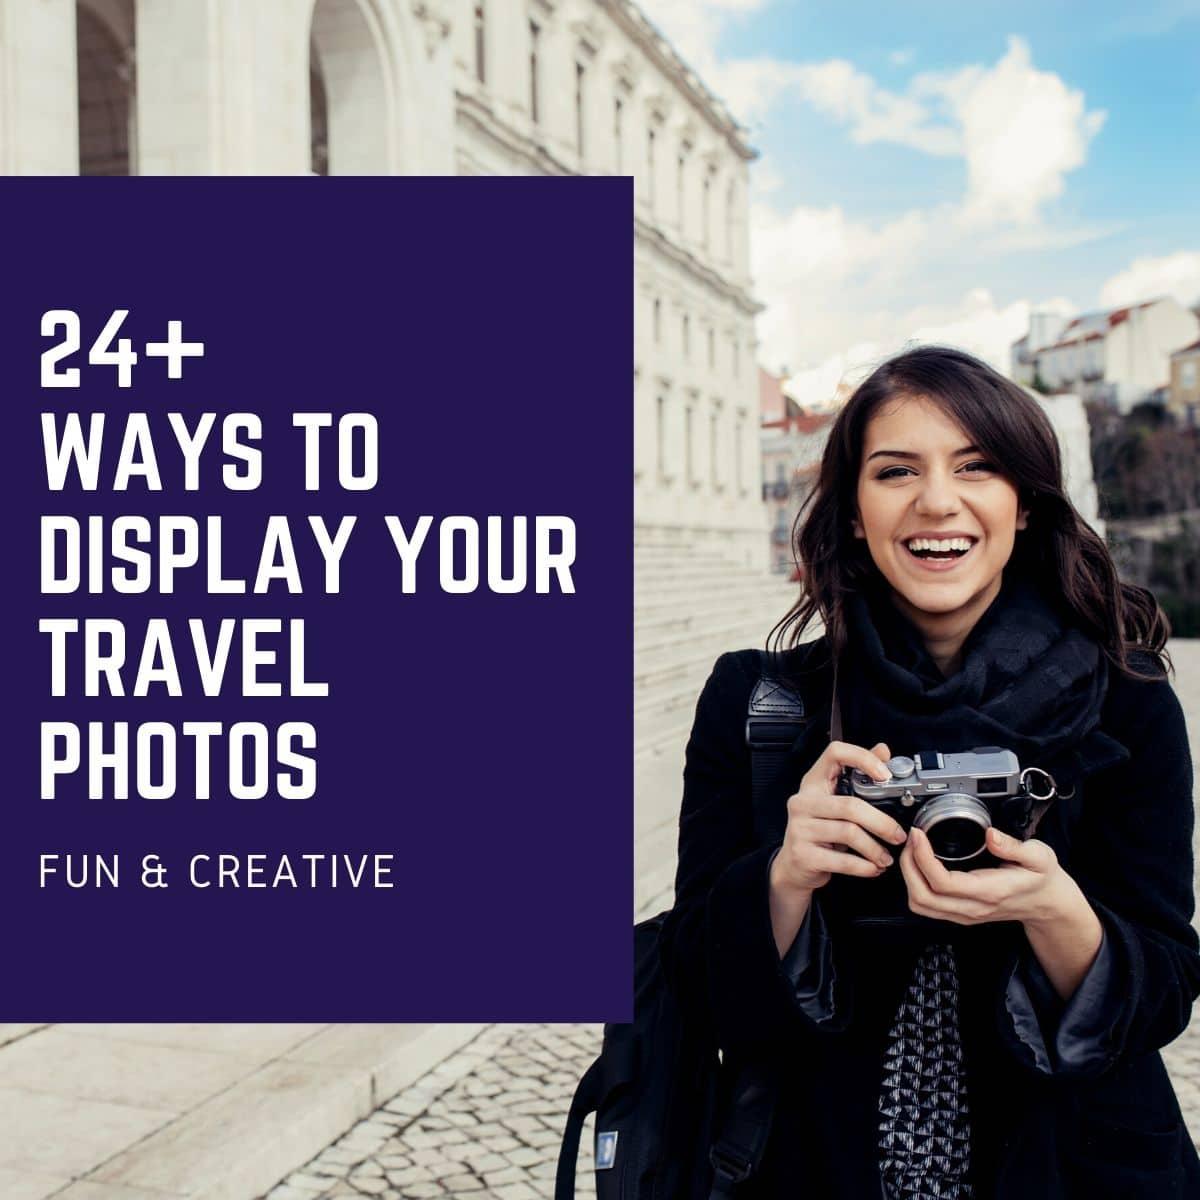 creative ways to display travel photos